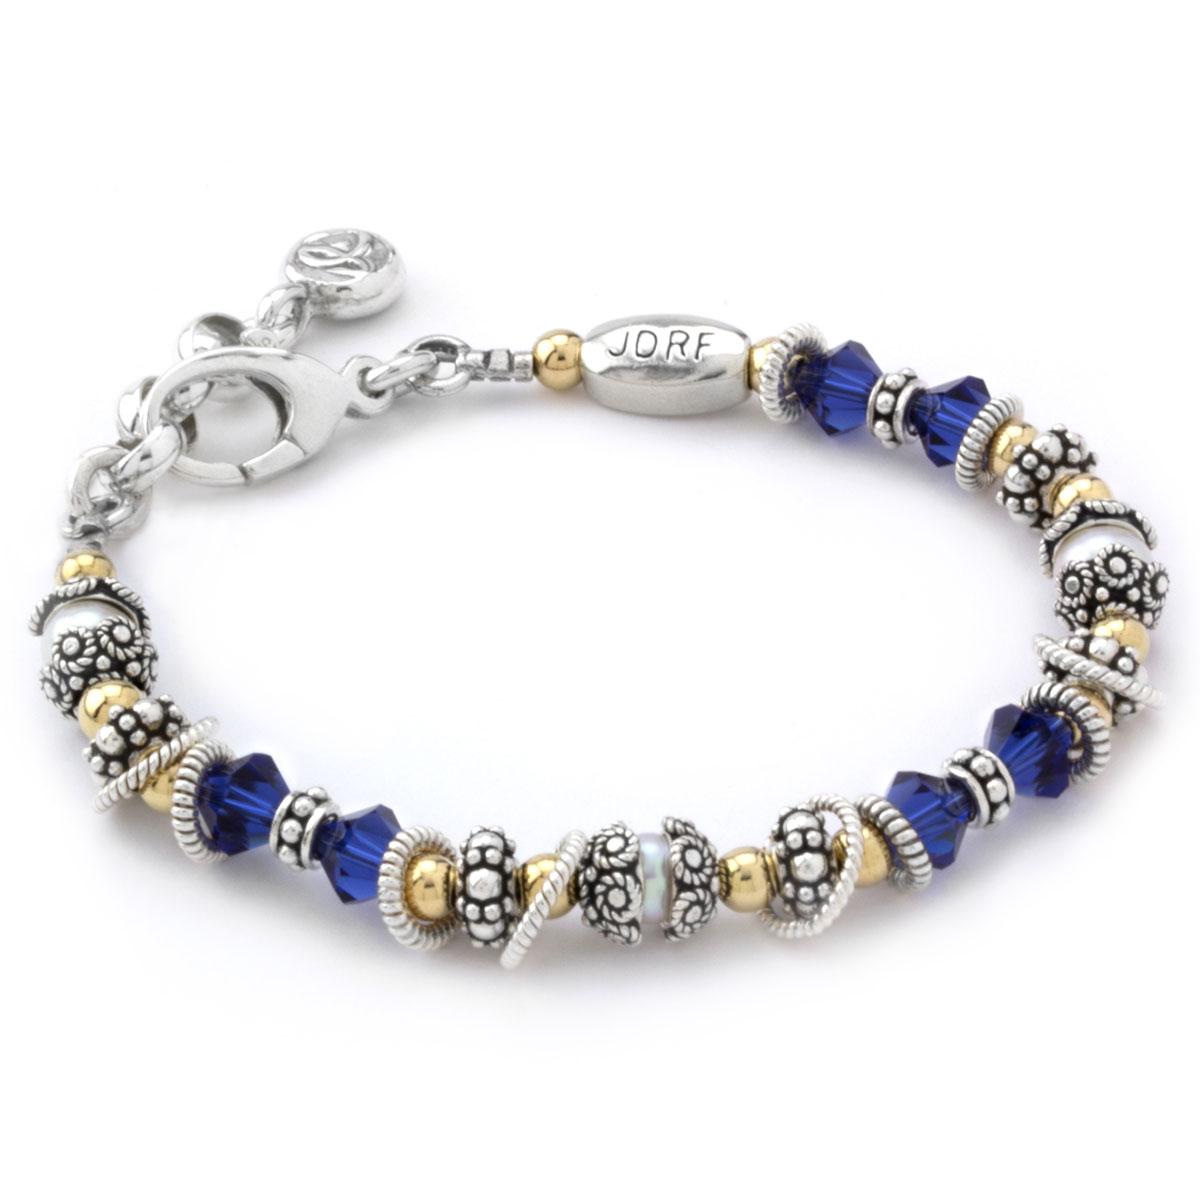 ce35241fe Juvenile Diabetes Awareness Jewelry #OG54 – Advancedmassagebysara